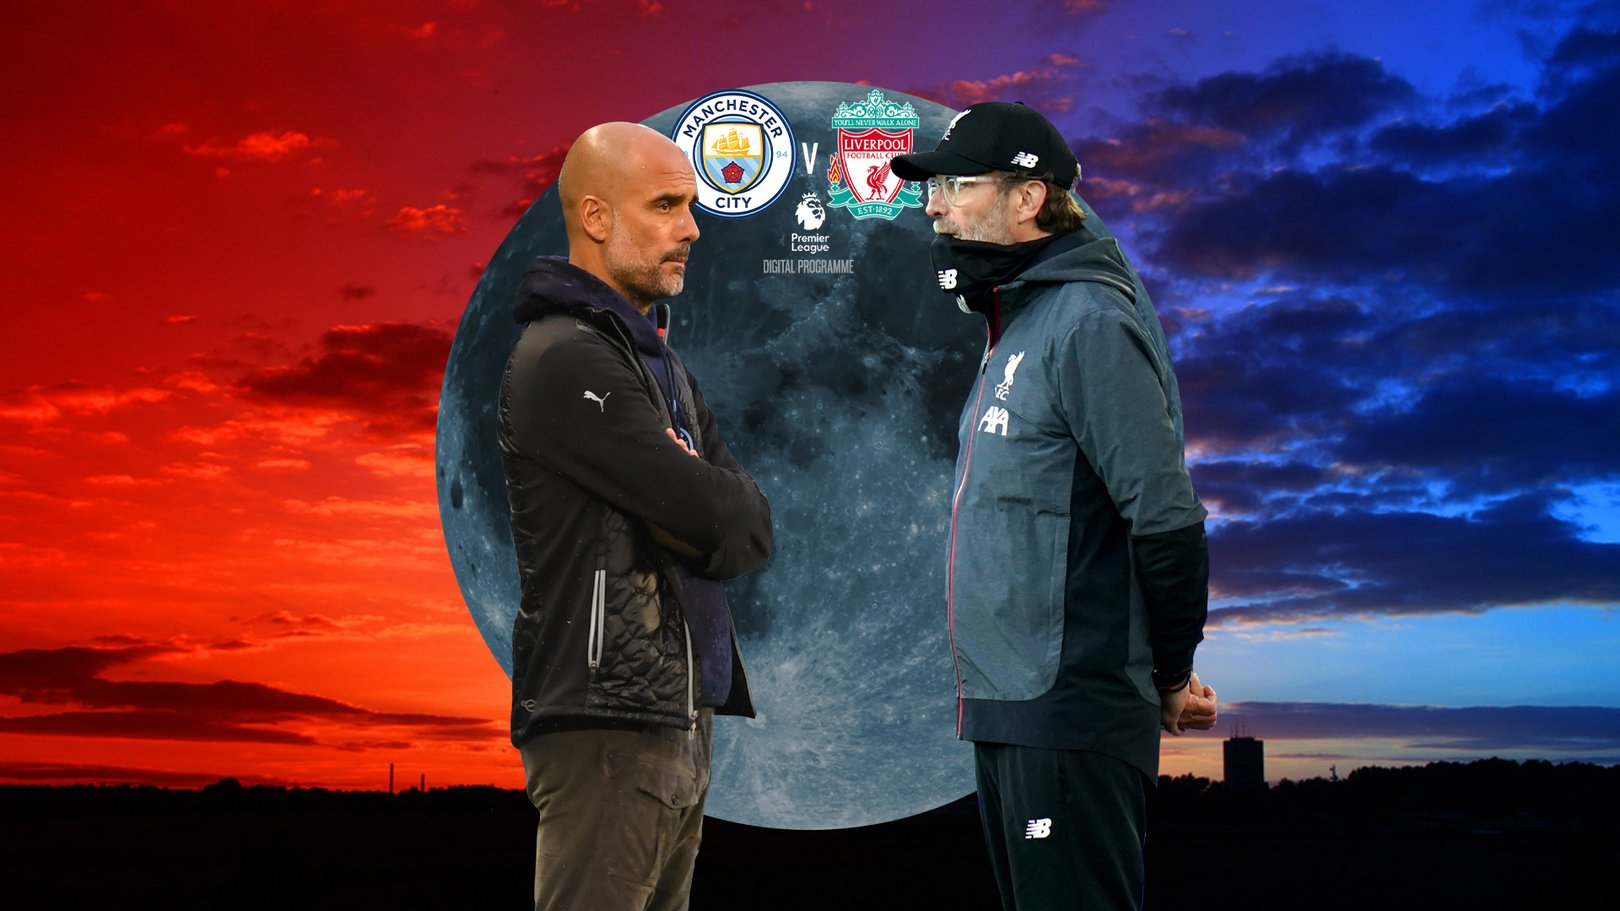 City v Liverpool Match Programme Cover